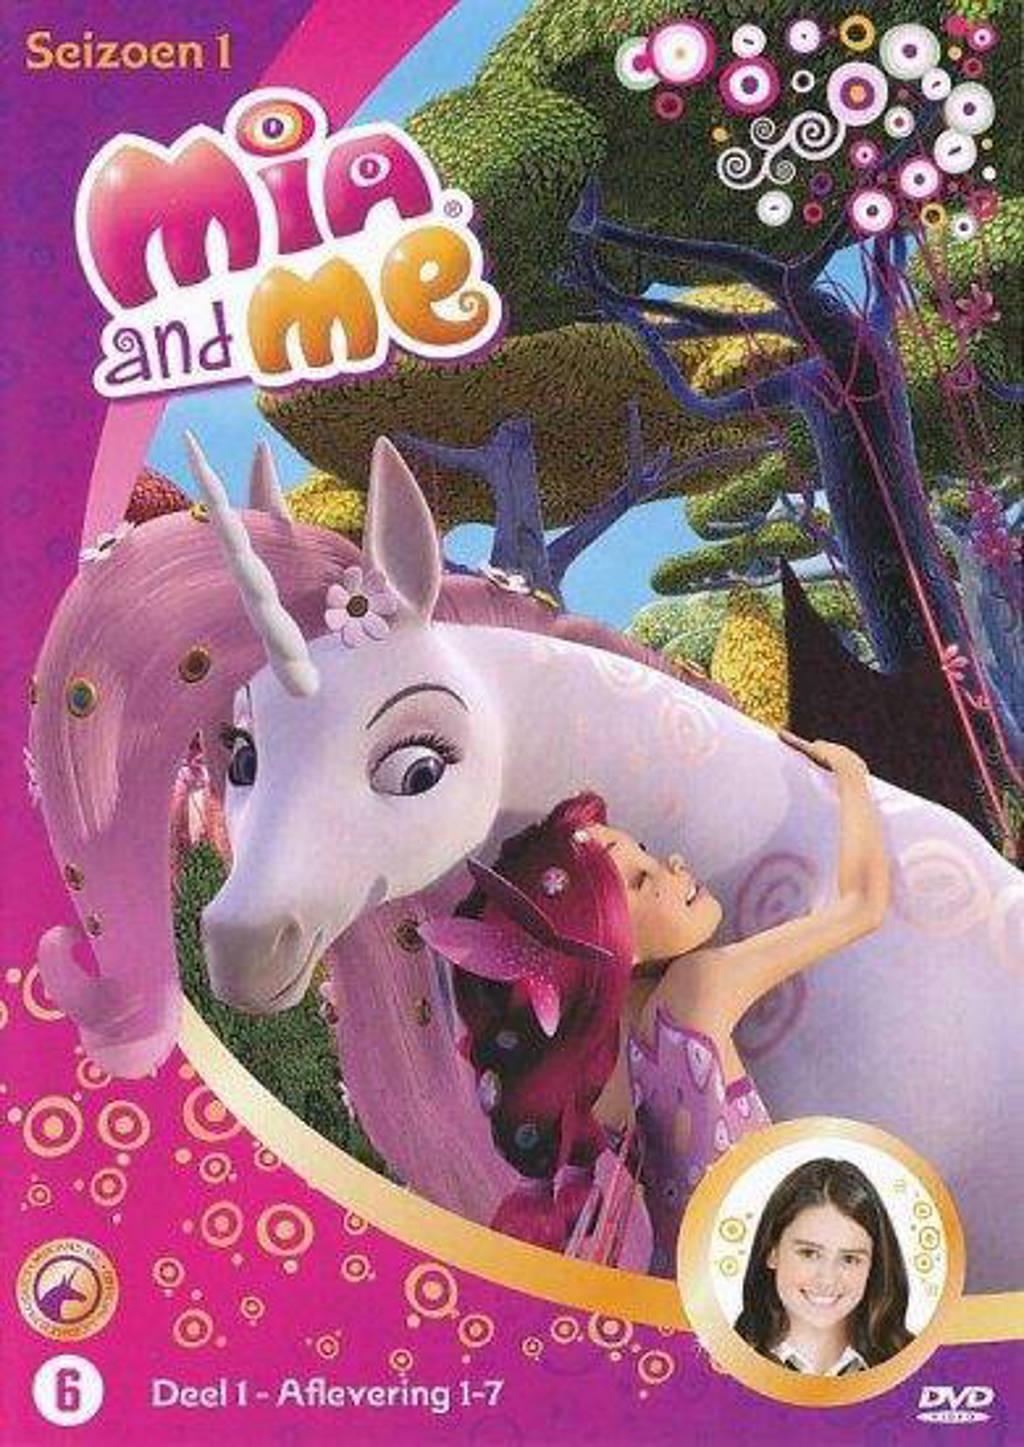 Mia and me - Seizoen 1 deel 1 (DVD)